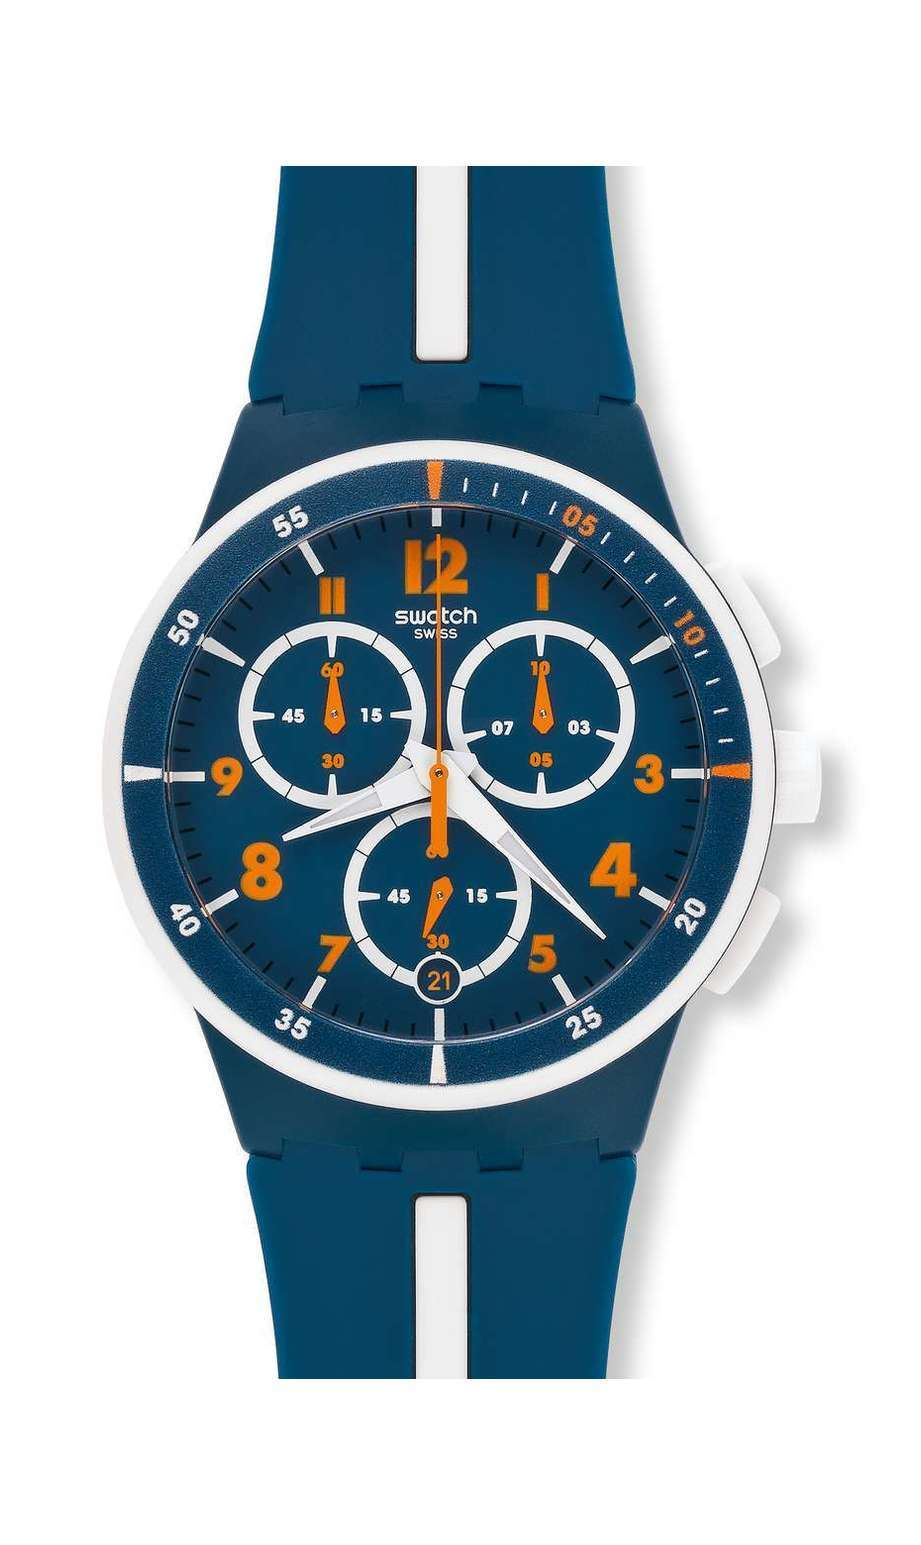 Swatch - WHITESPEED - 1